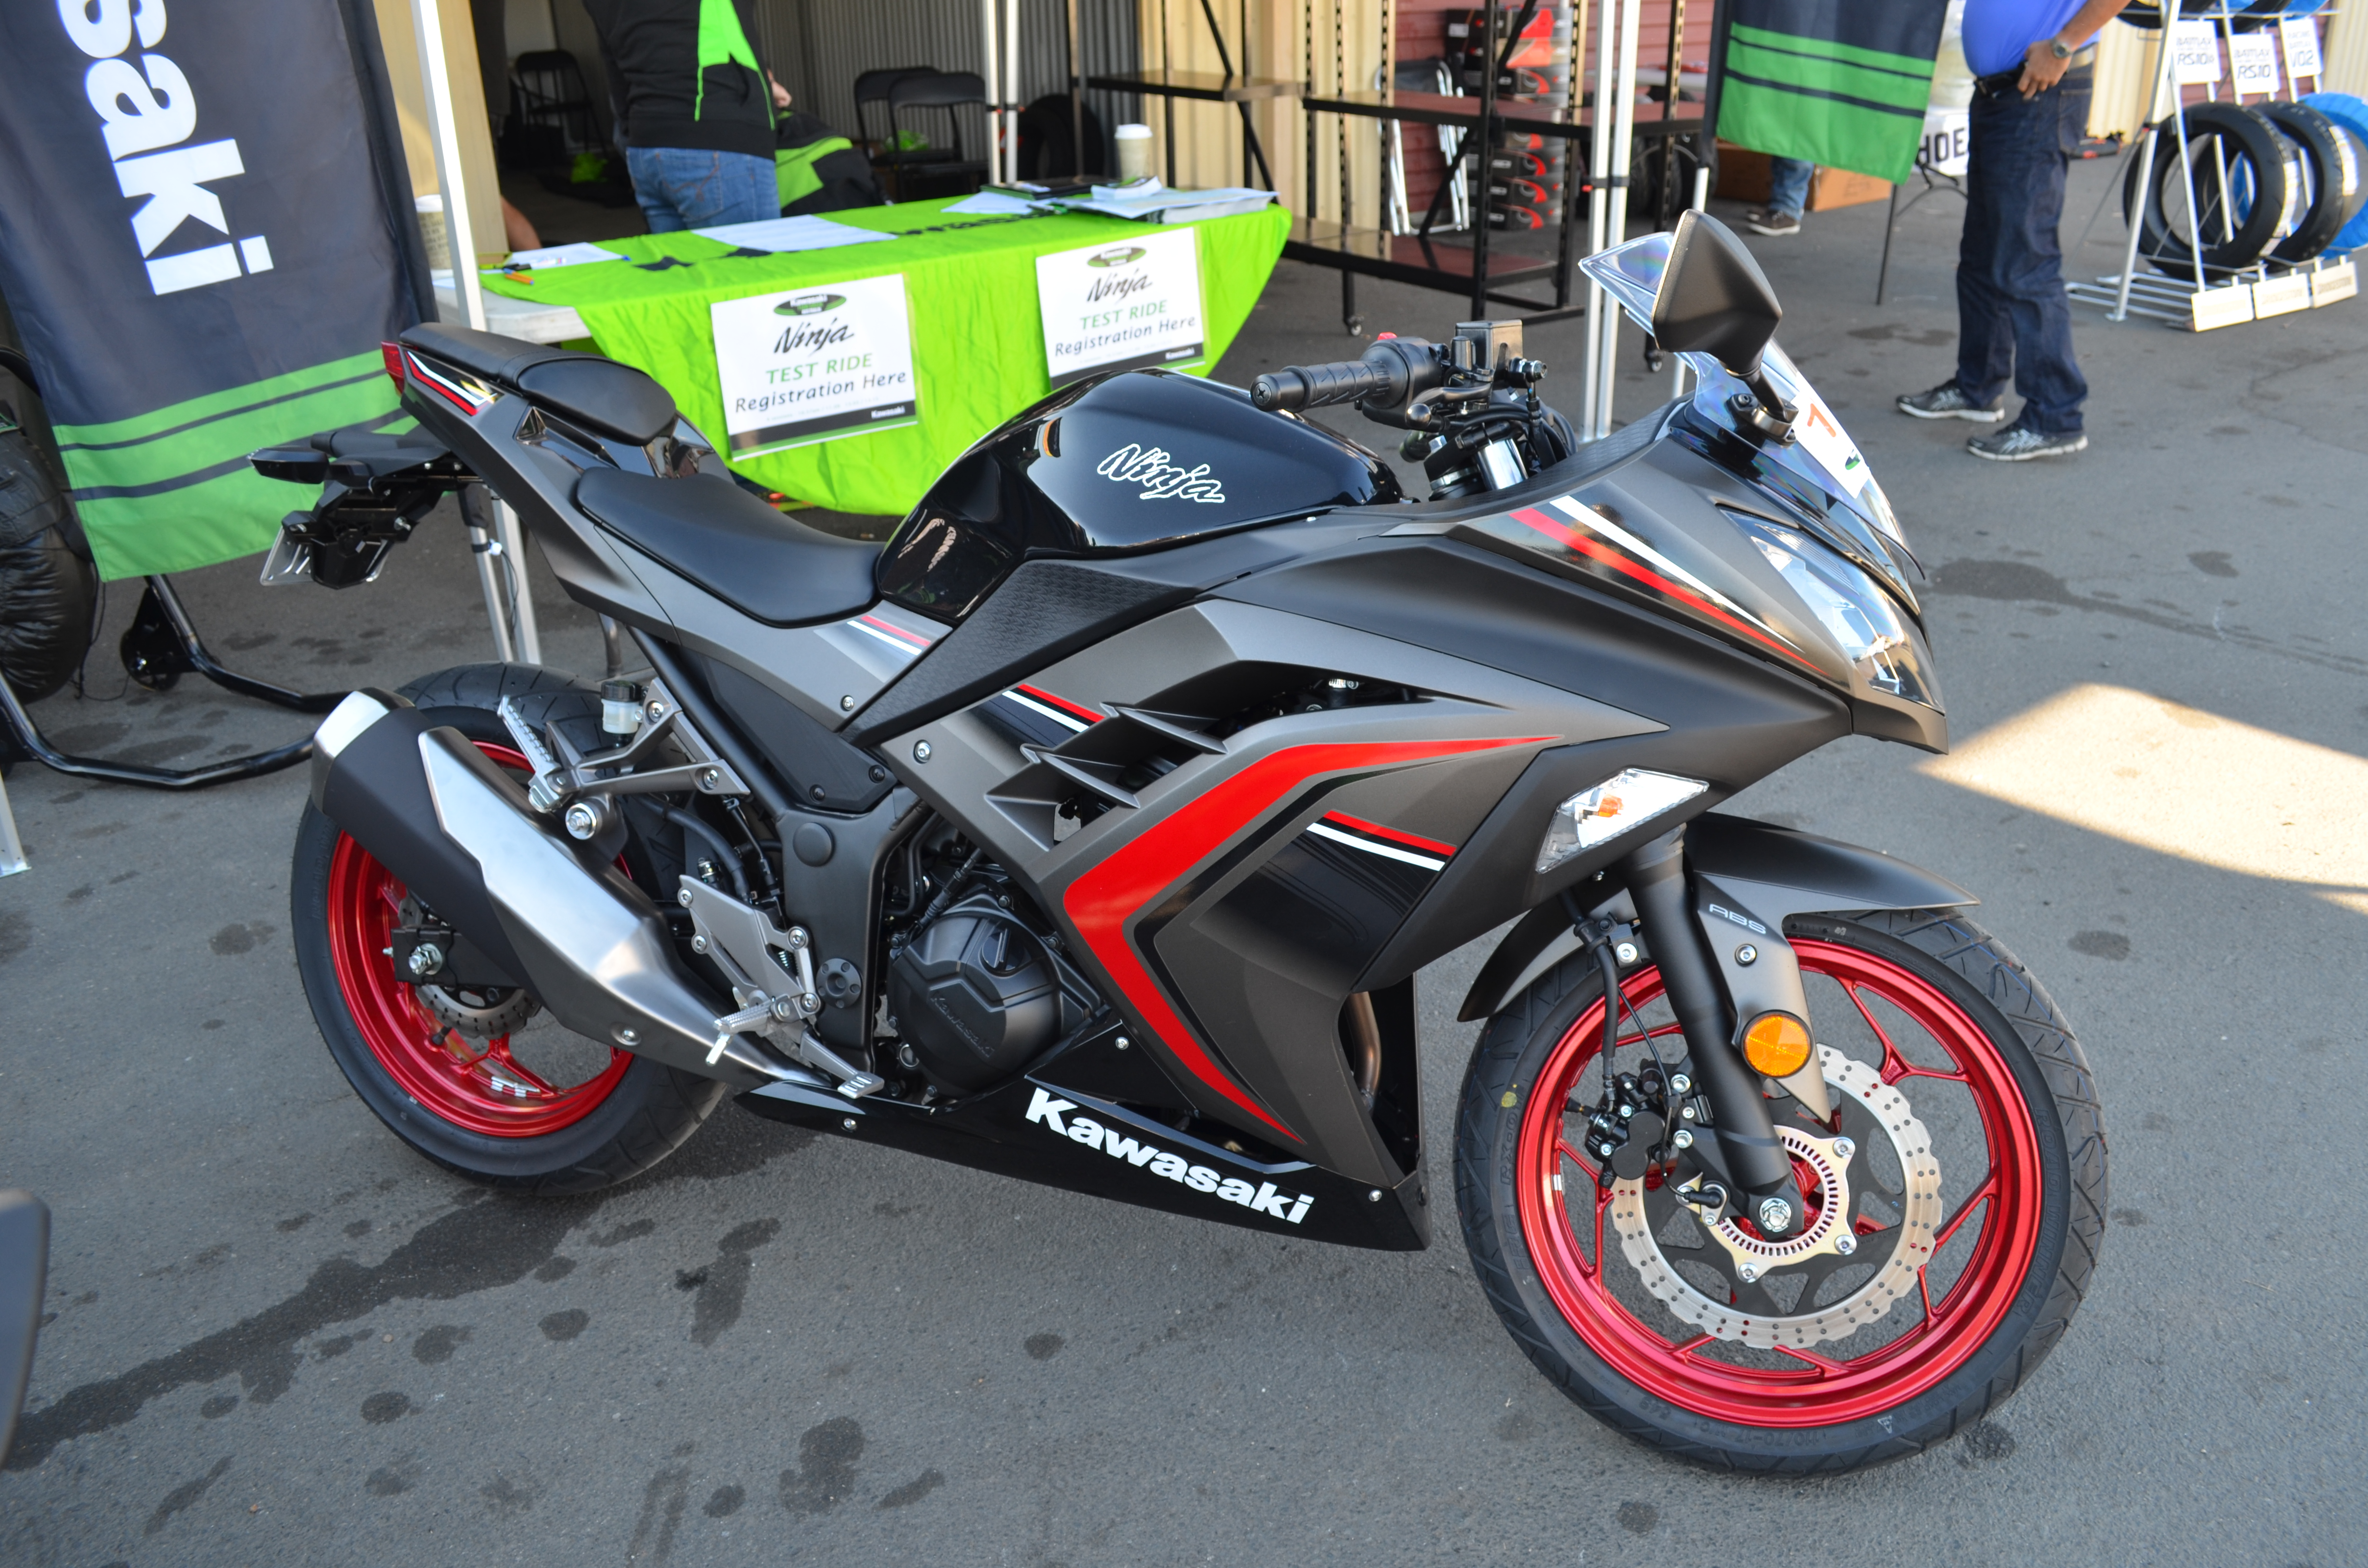 2015 Kawasaki Ninja 300 Abs Test And Track Ride Onthebackwheelcom